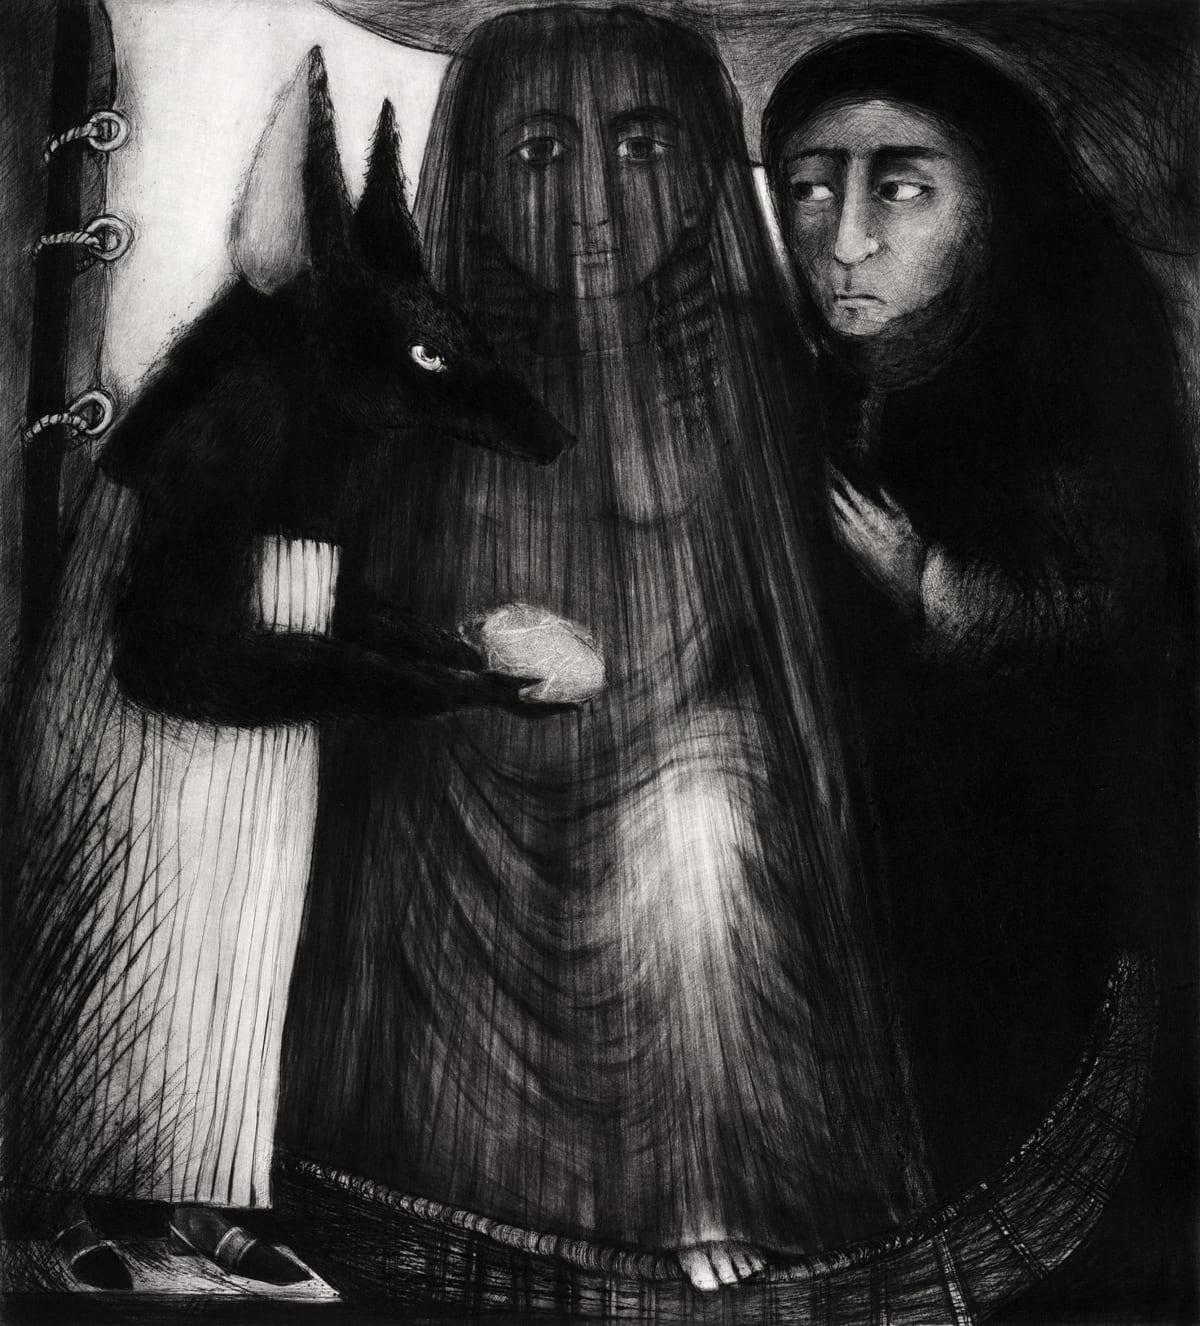 Ana Maria Pacheco, Dark Event VII, 2007 Drypoint